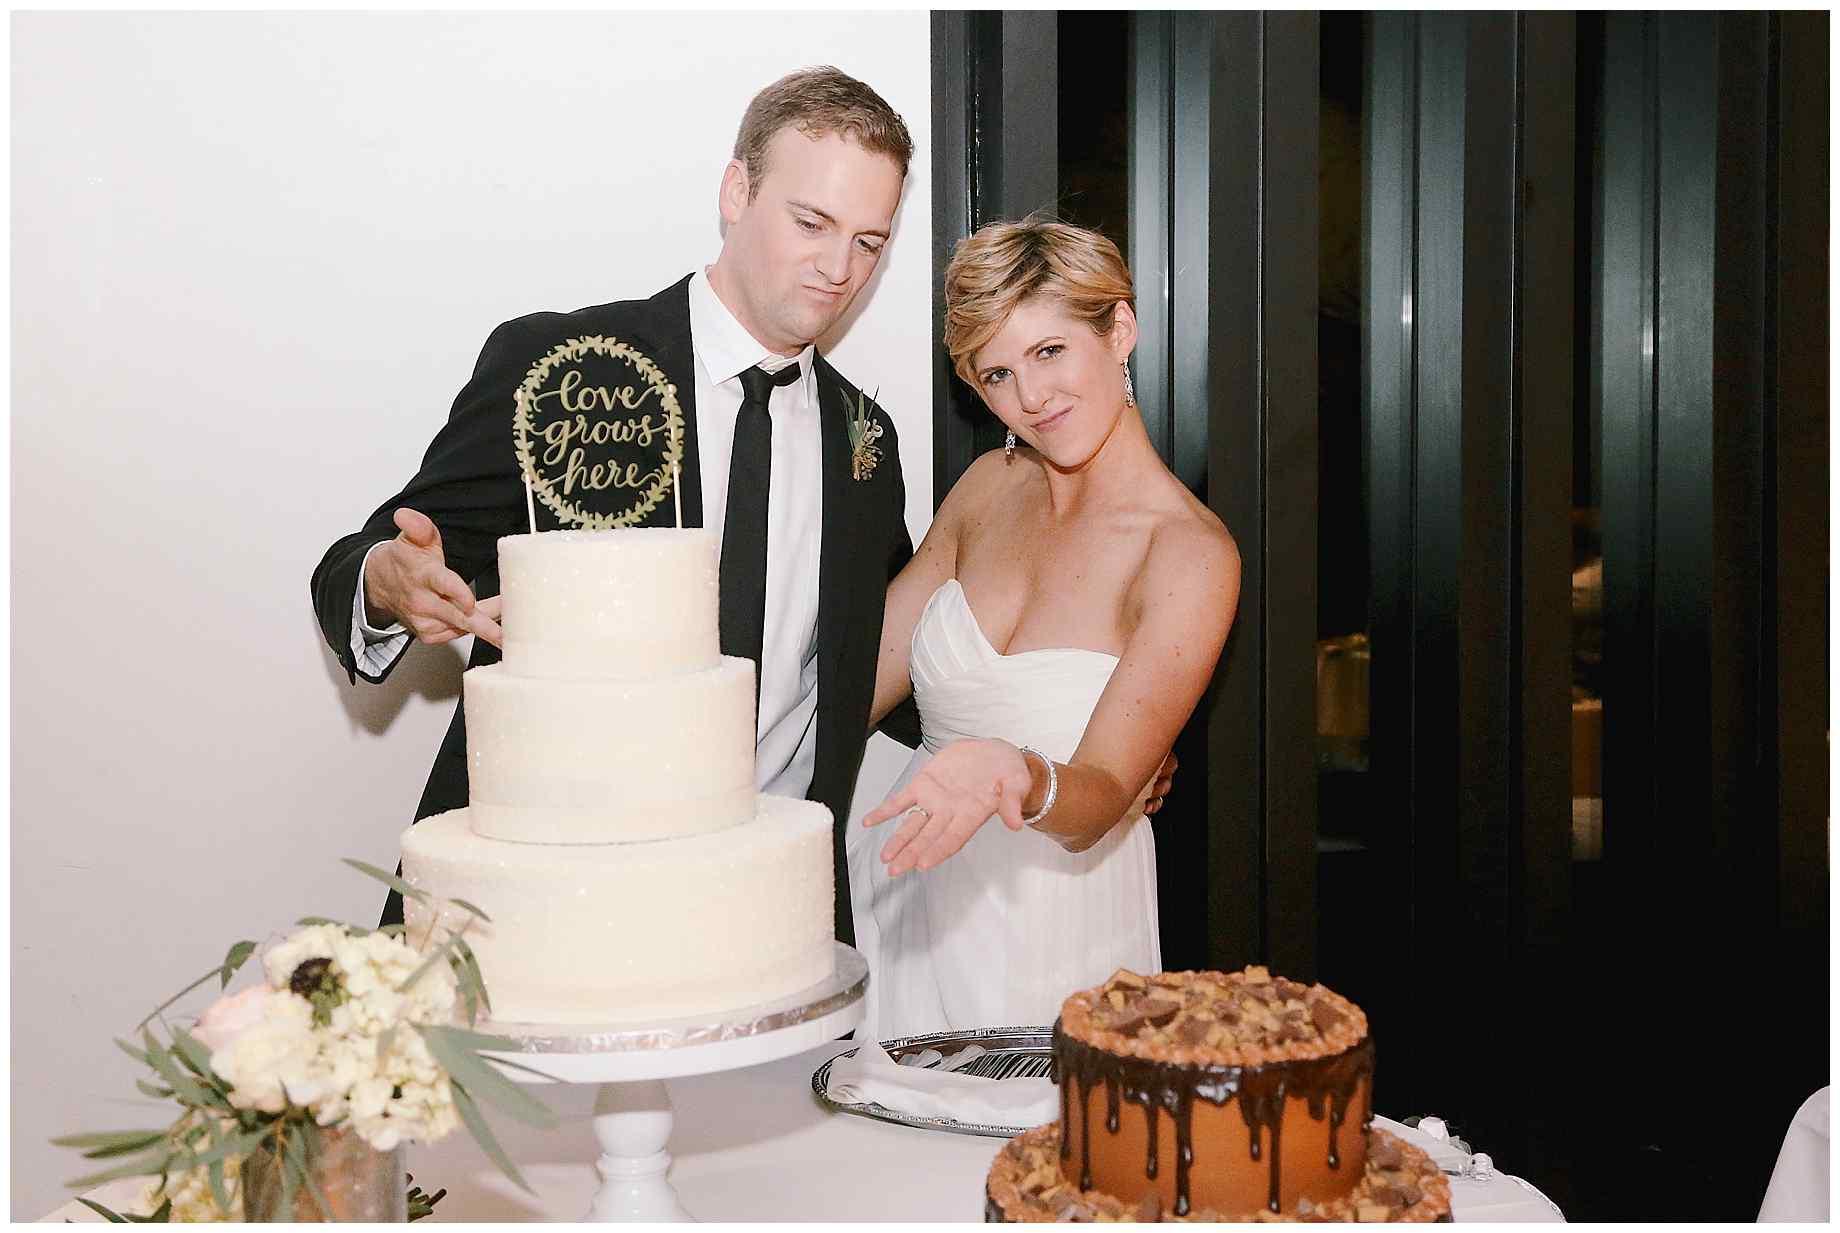 best-wedding-photos-2014-10